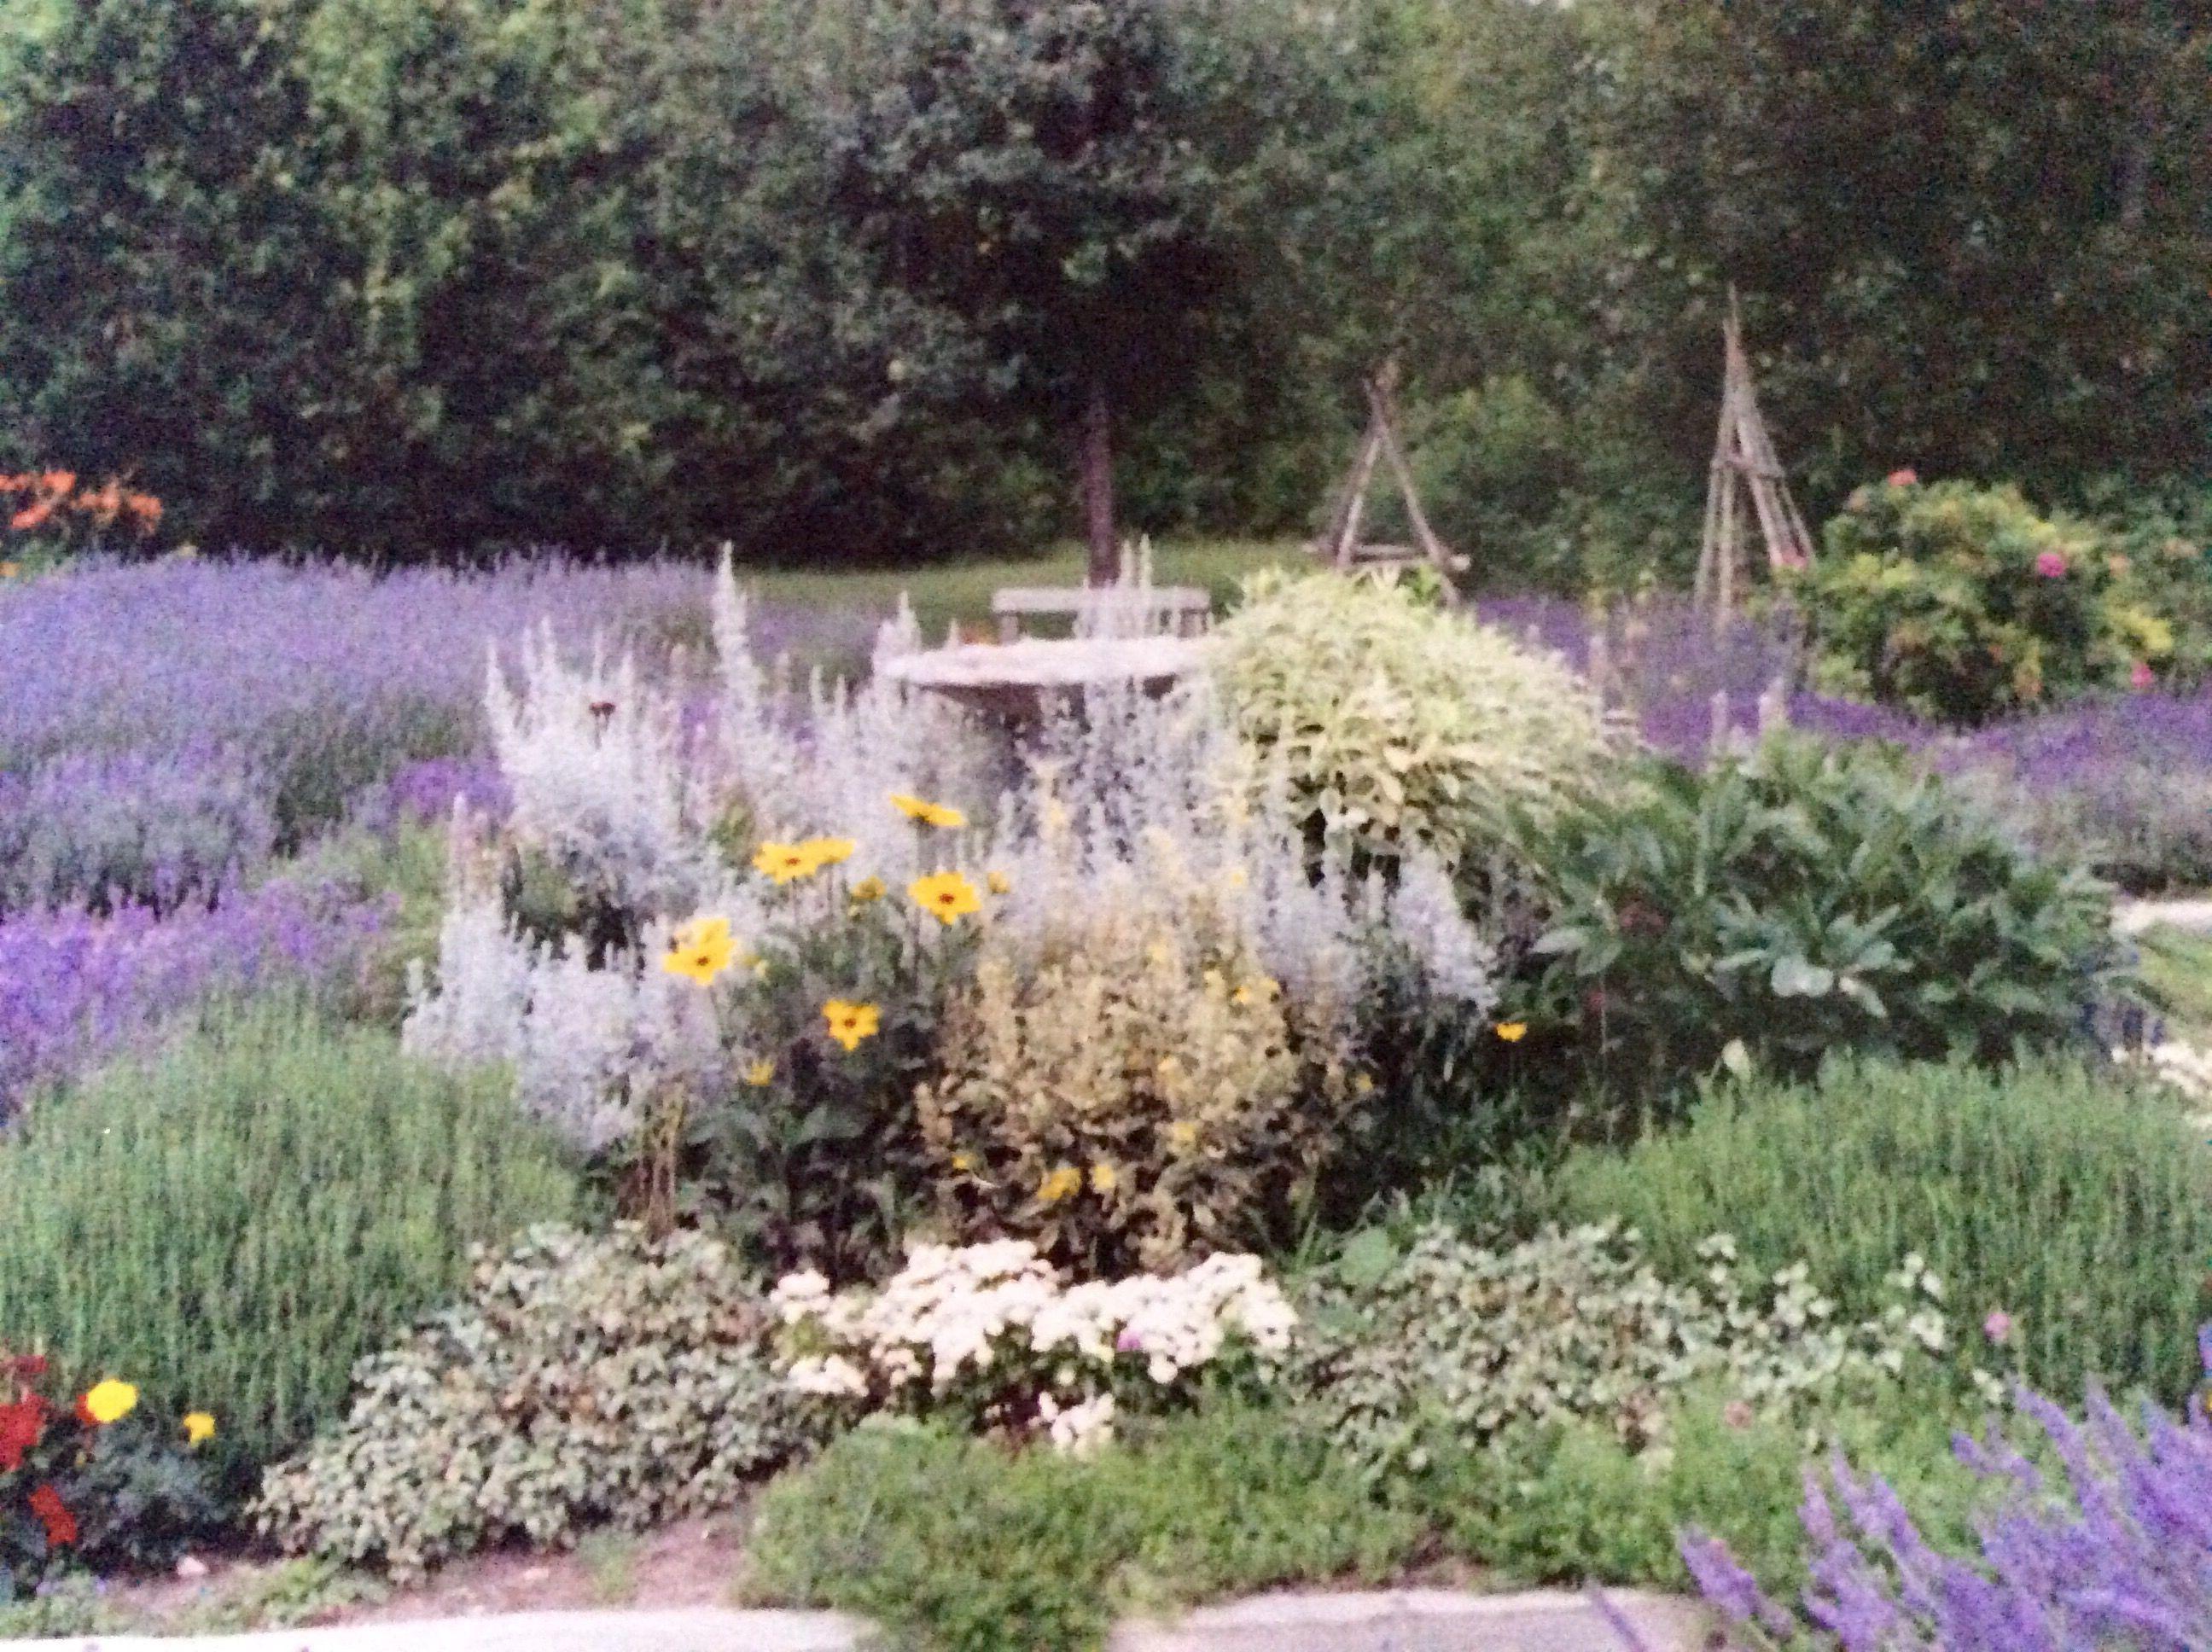 Stoney Hollow Lavender's garden.